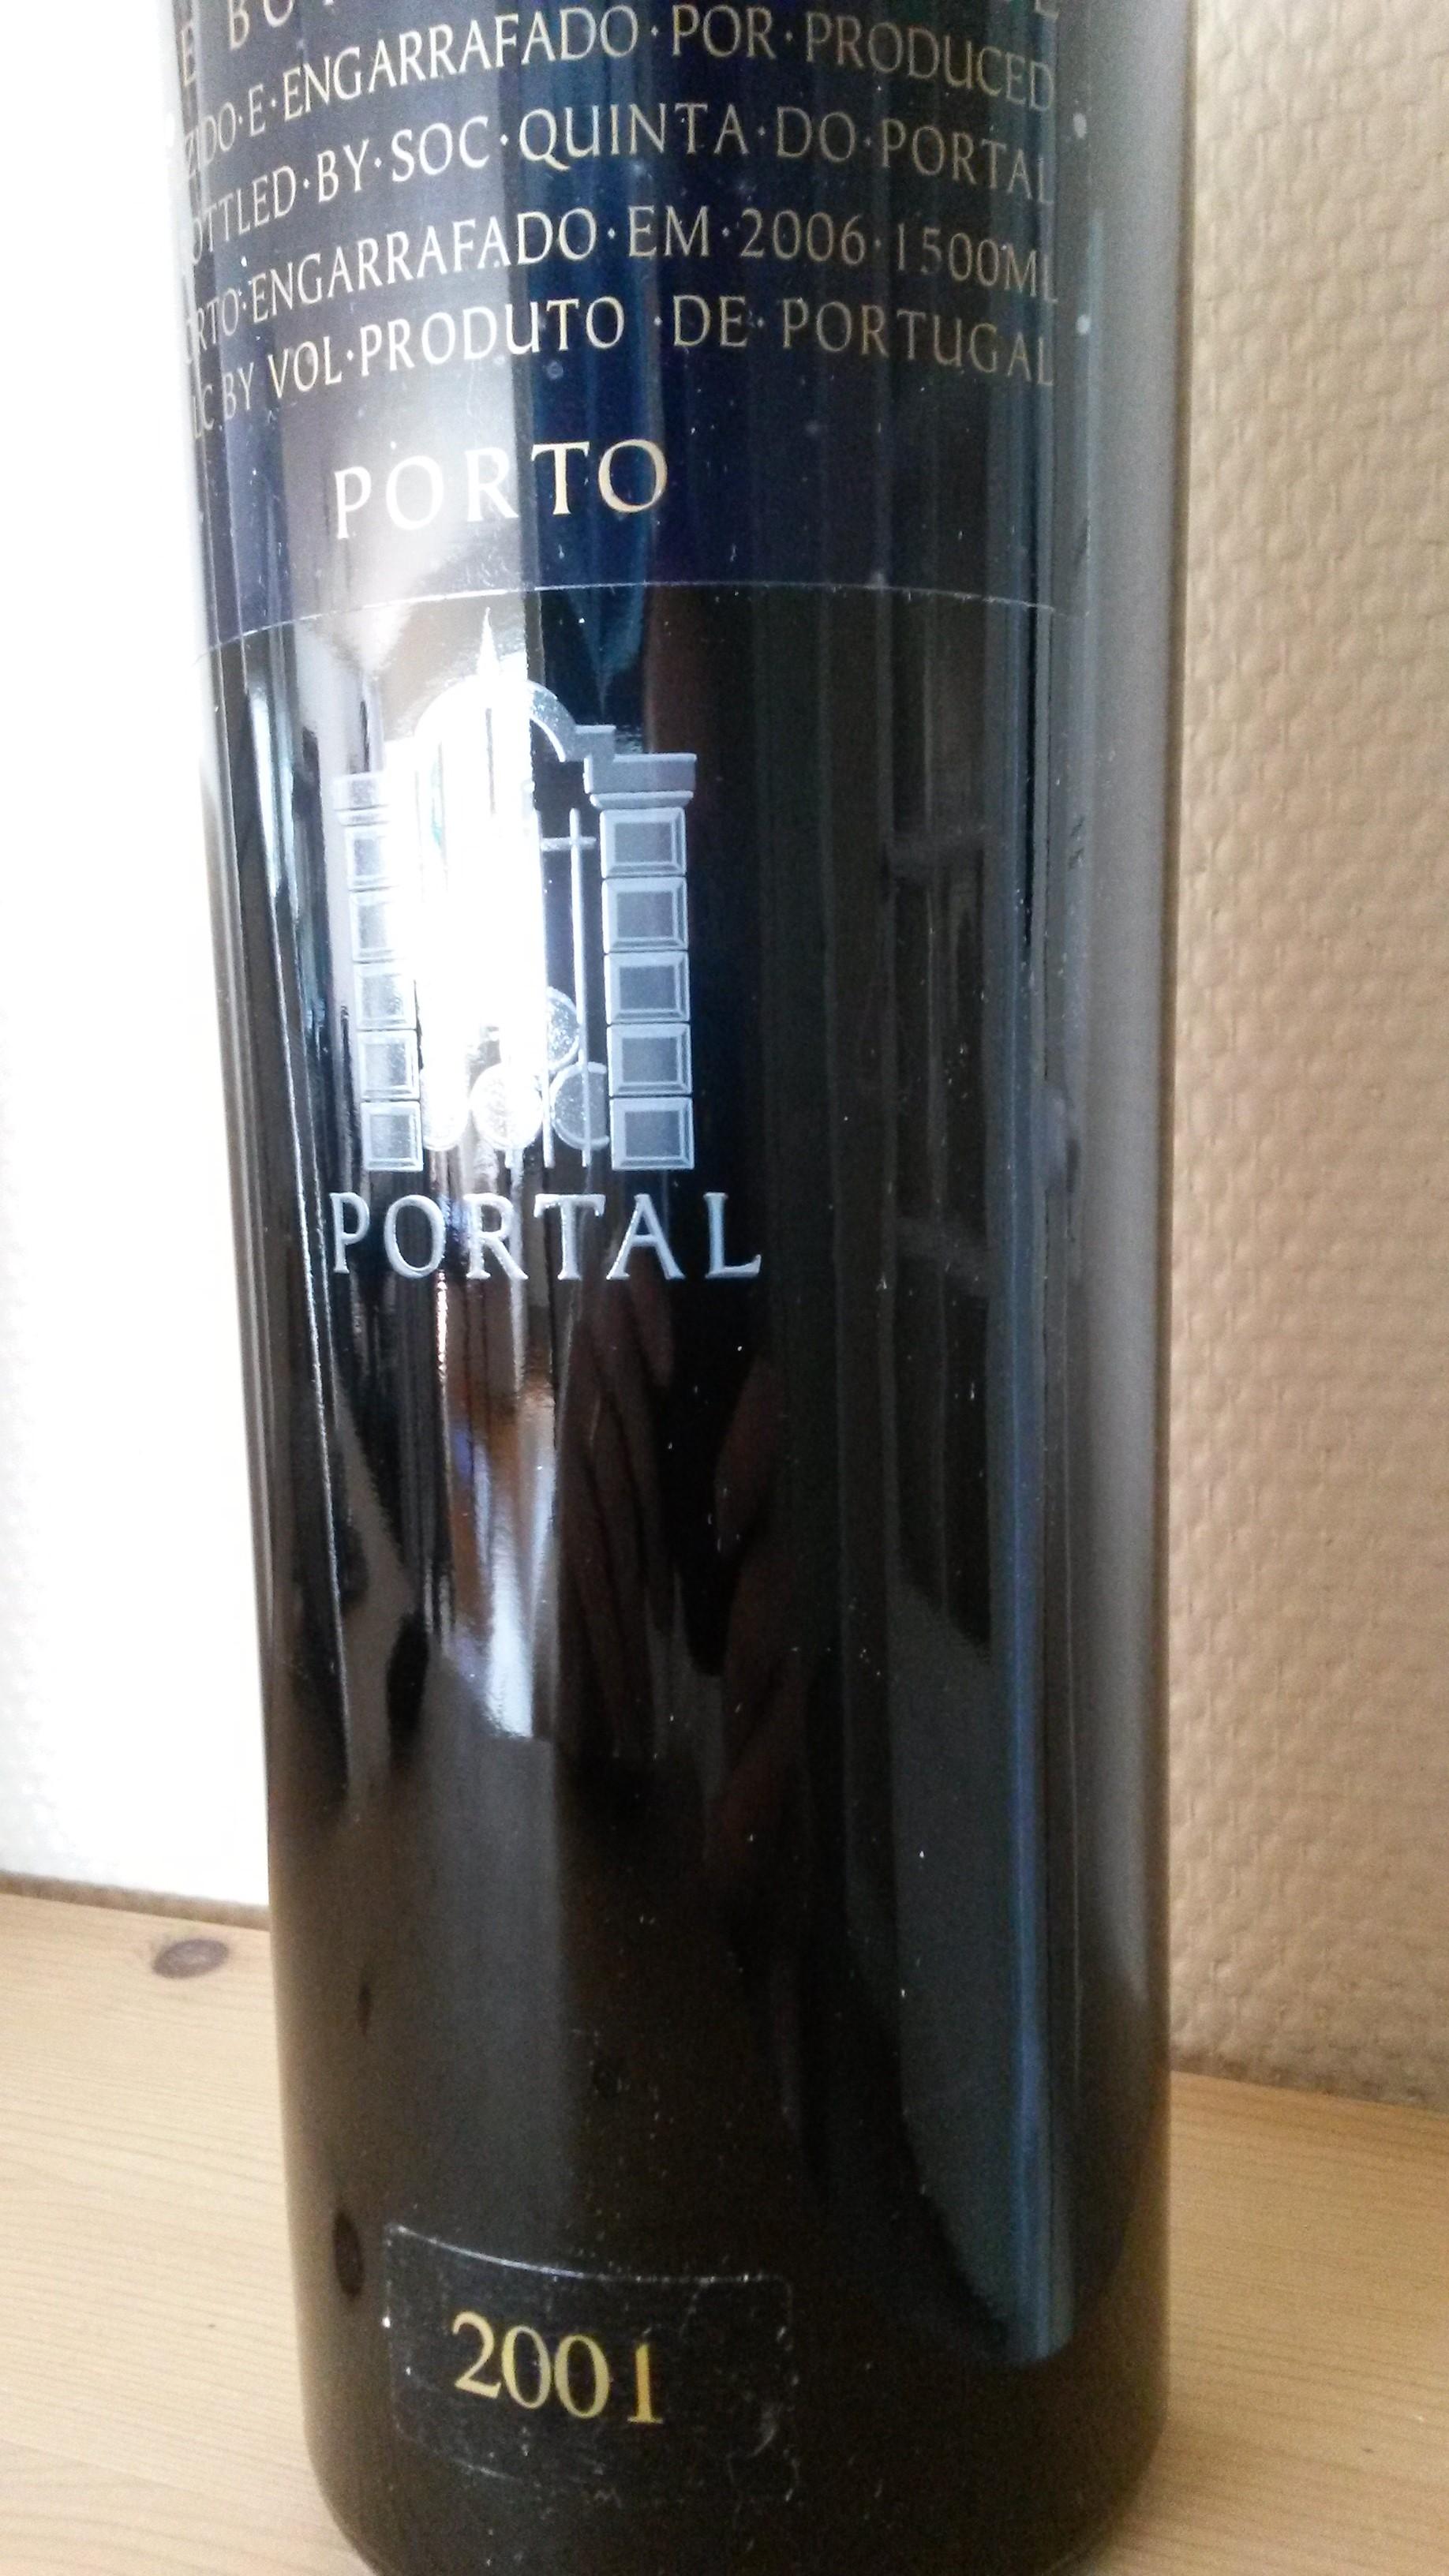 Portal LBV 01 Mag